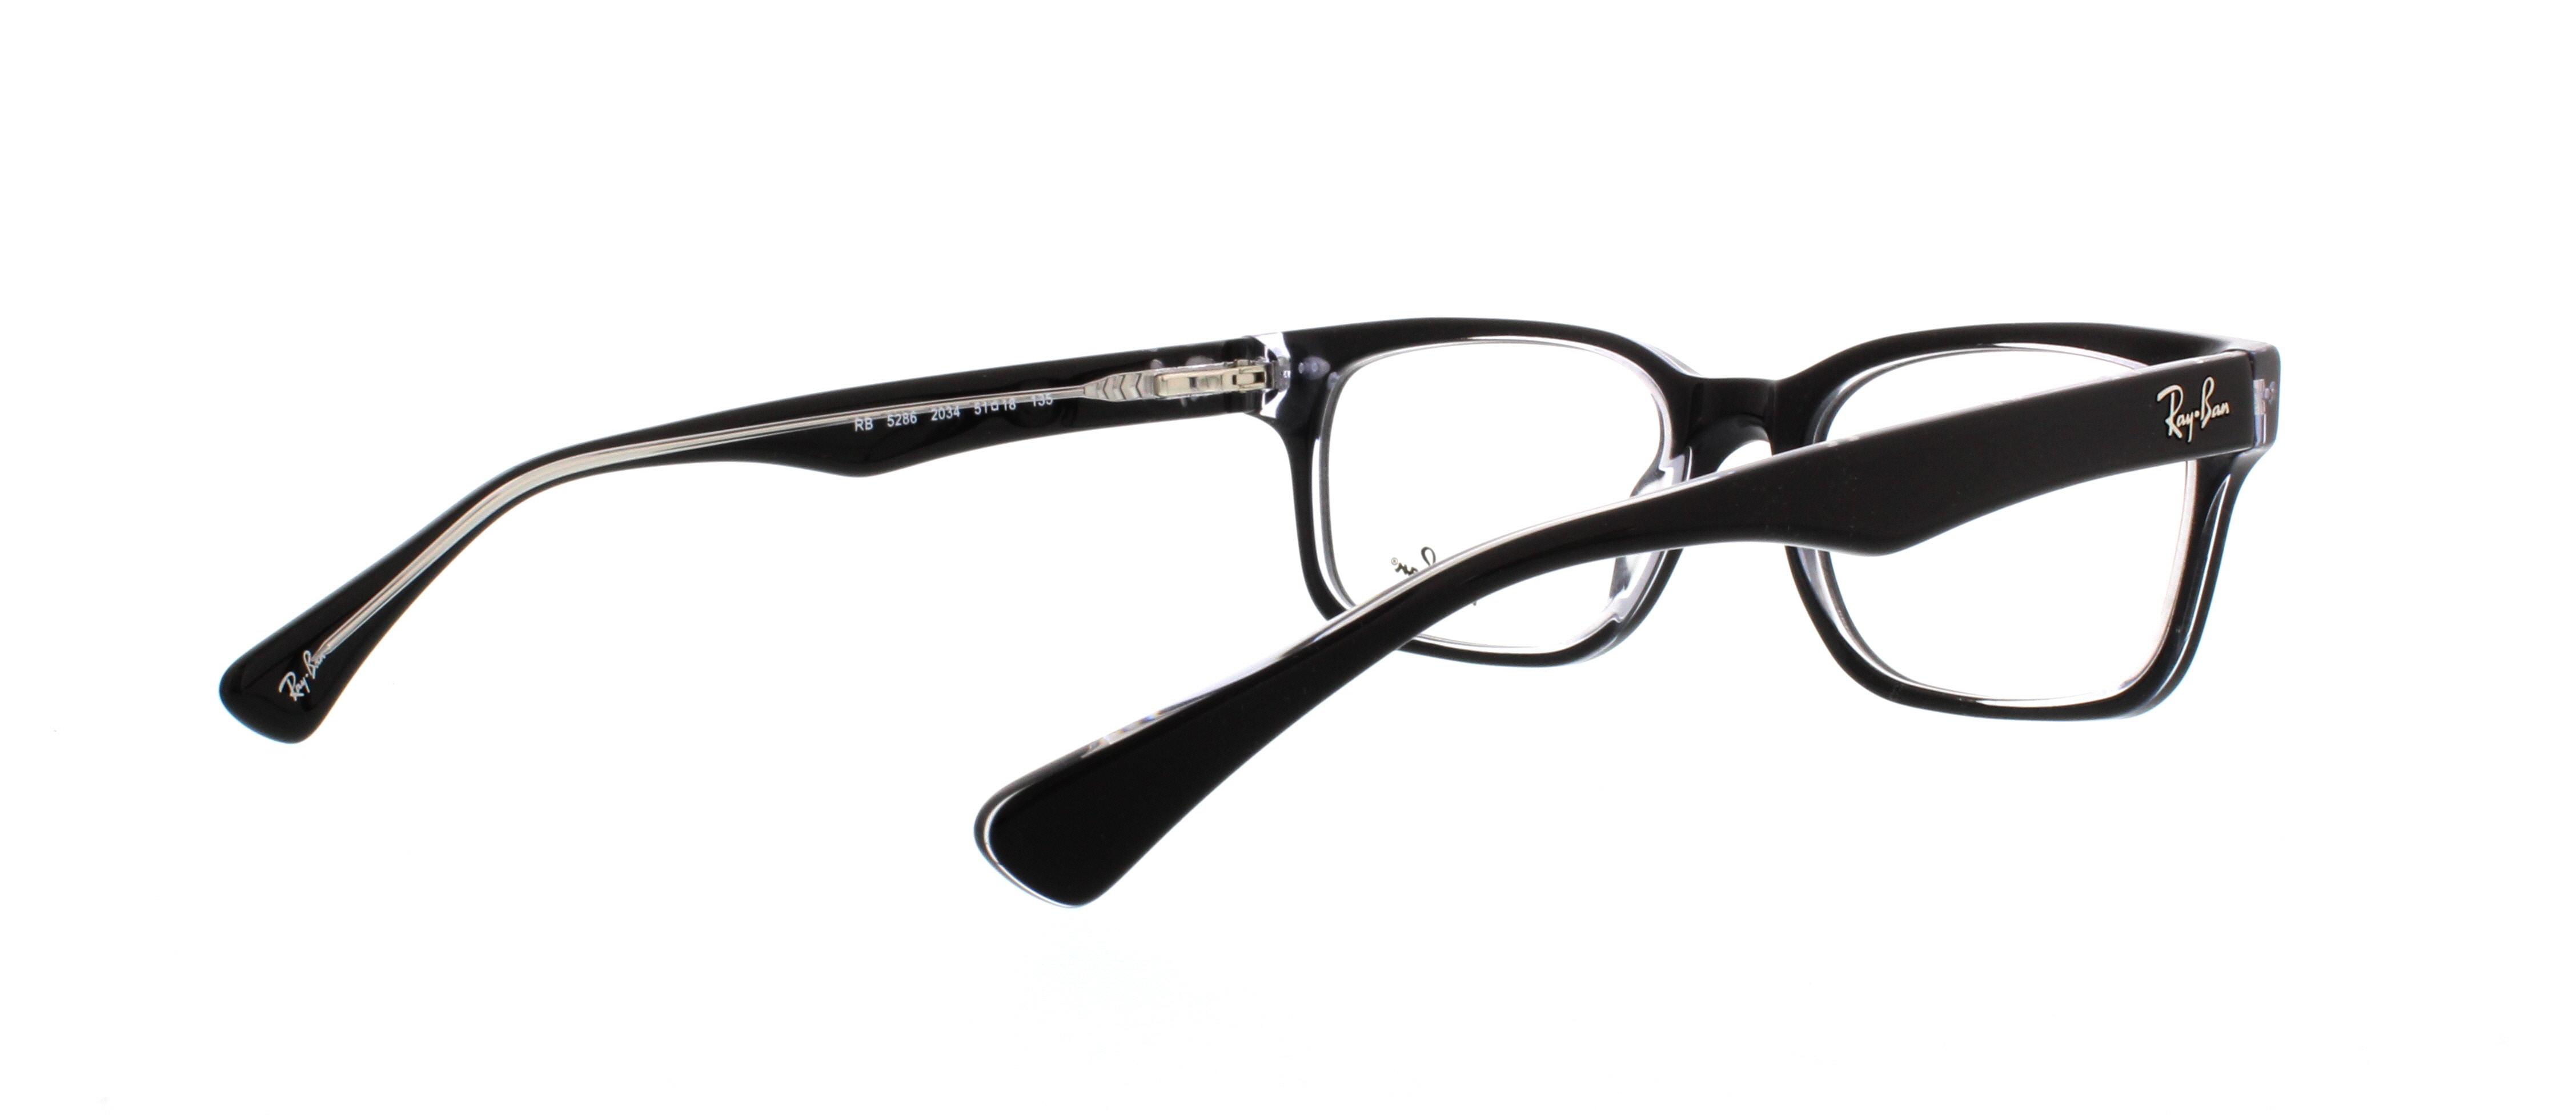 554e0fb92e70f Ray Ban Rx5286 Eyeglasses – Southern California Weather Force